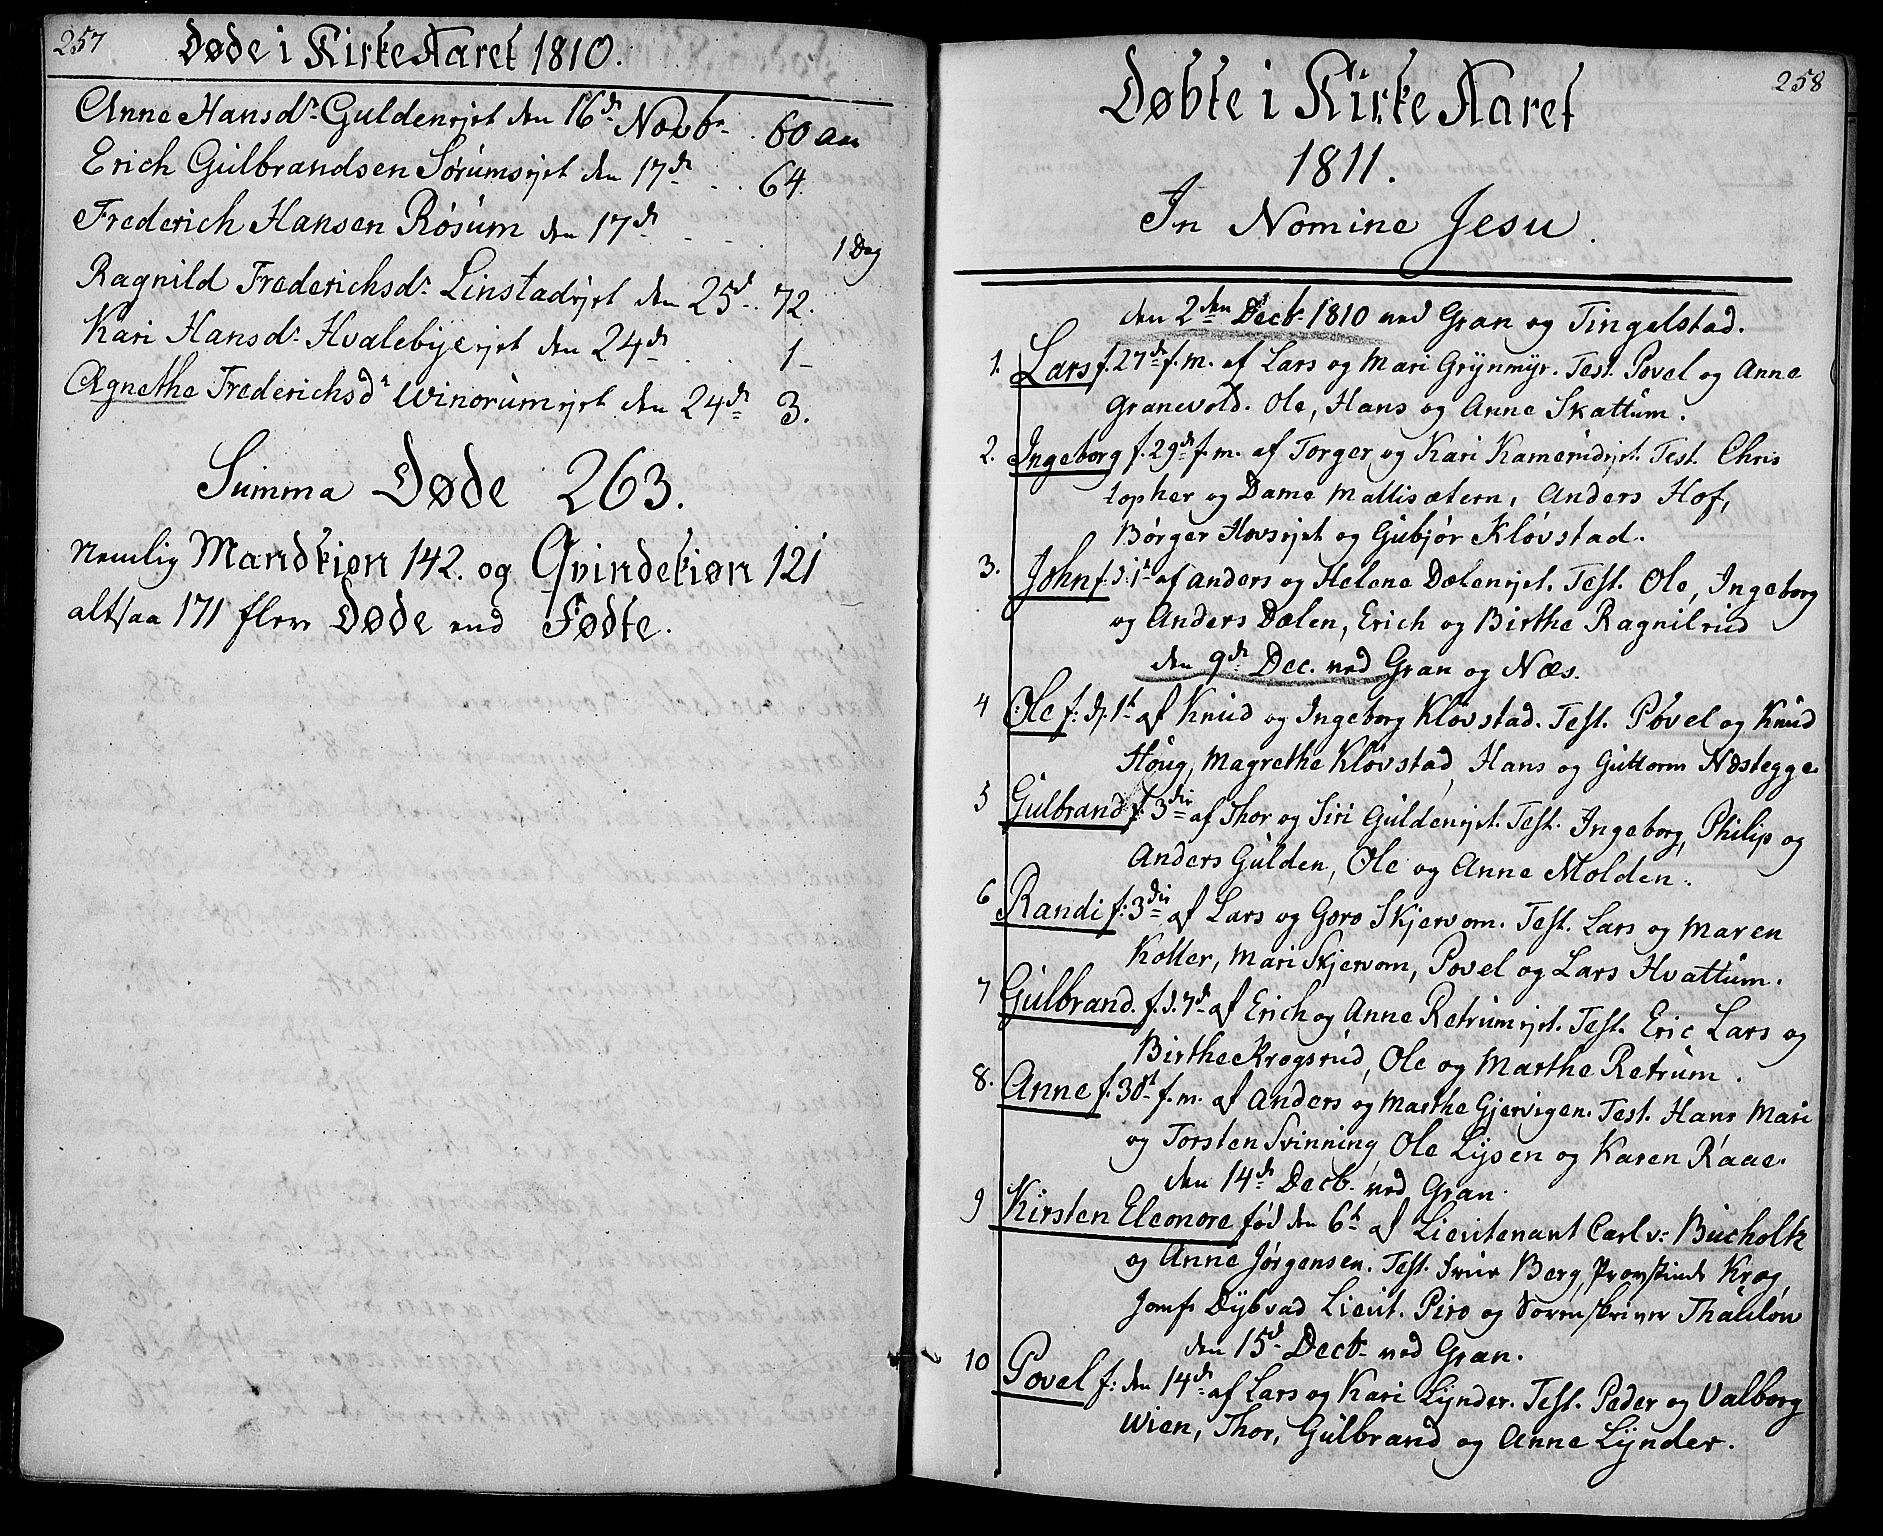 SAH, Gran prestekontor, Ministerialbok nr. 8, 1798-1811, s. 257-258